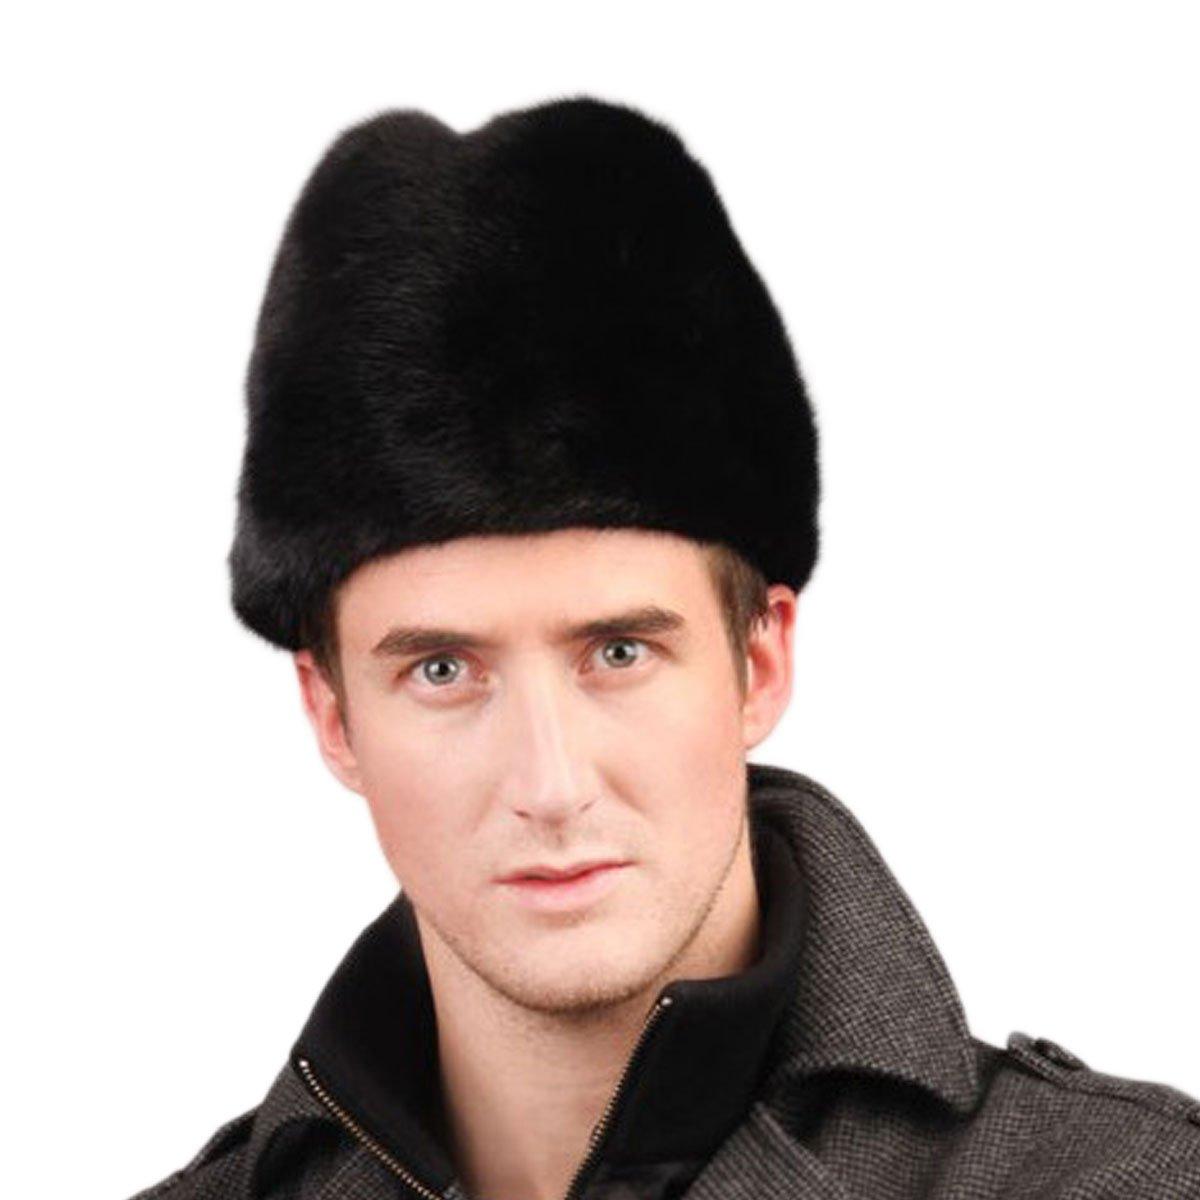 URSFUR Men's Mink Fur Knit Skull Caps Black